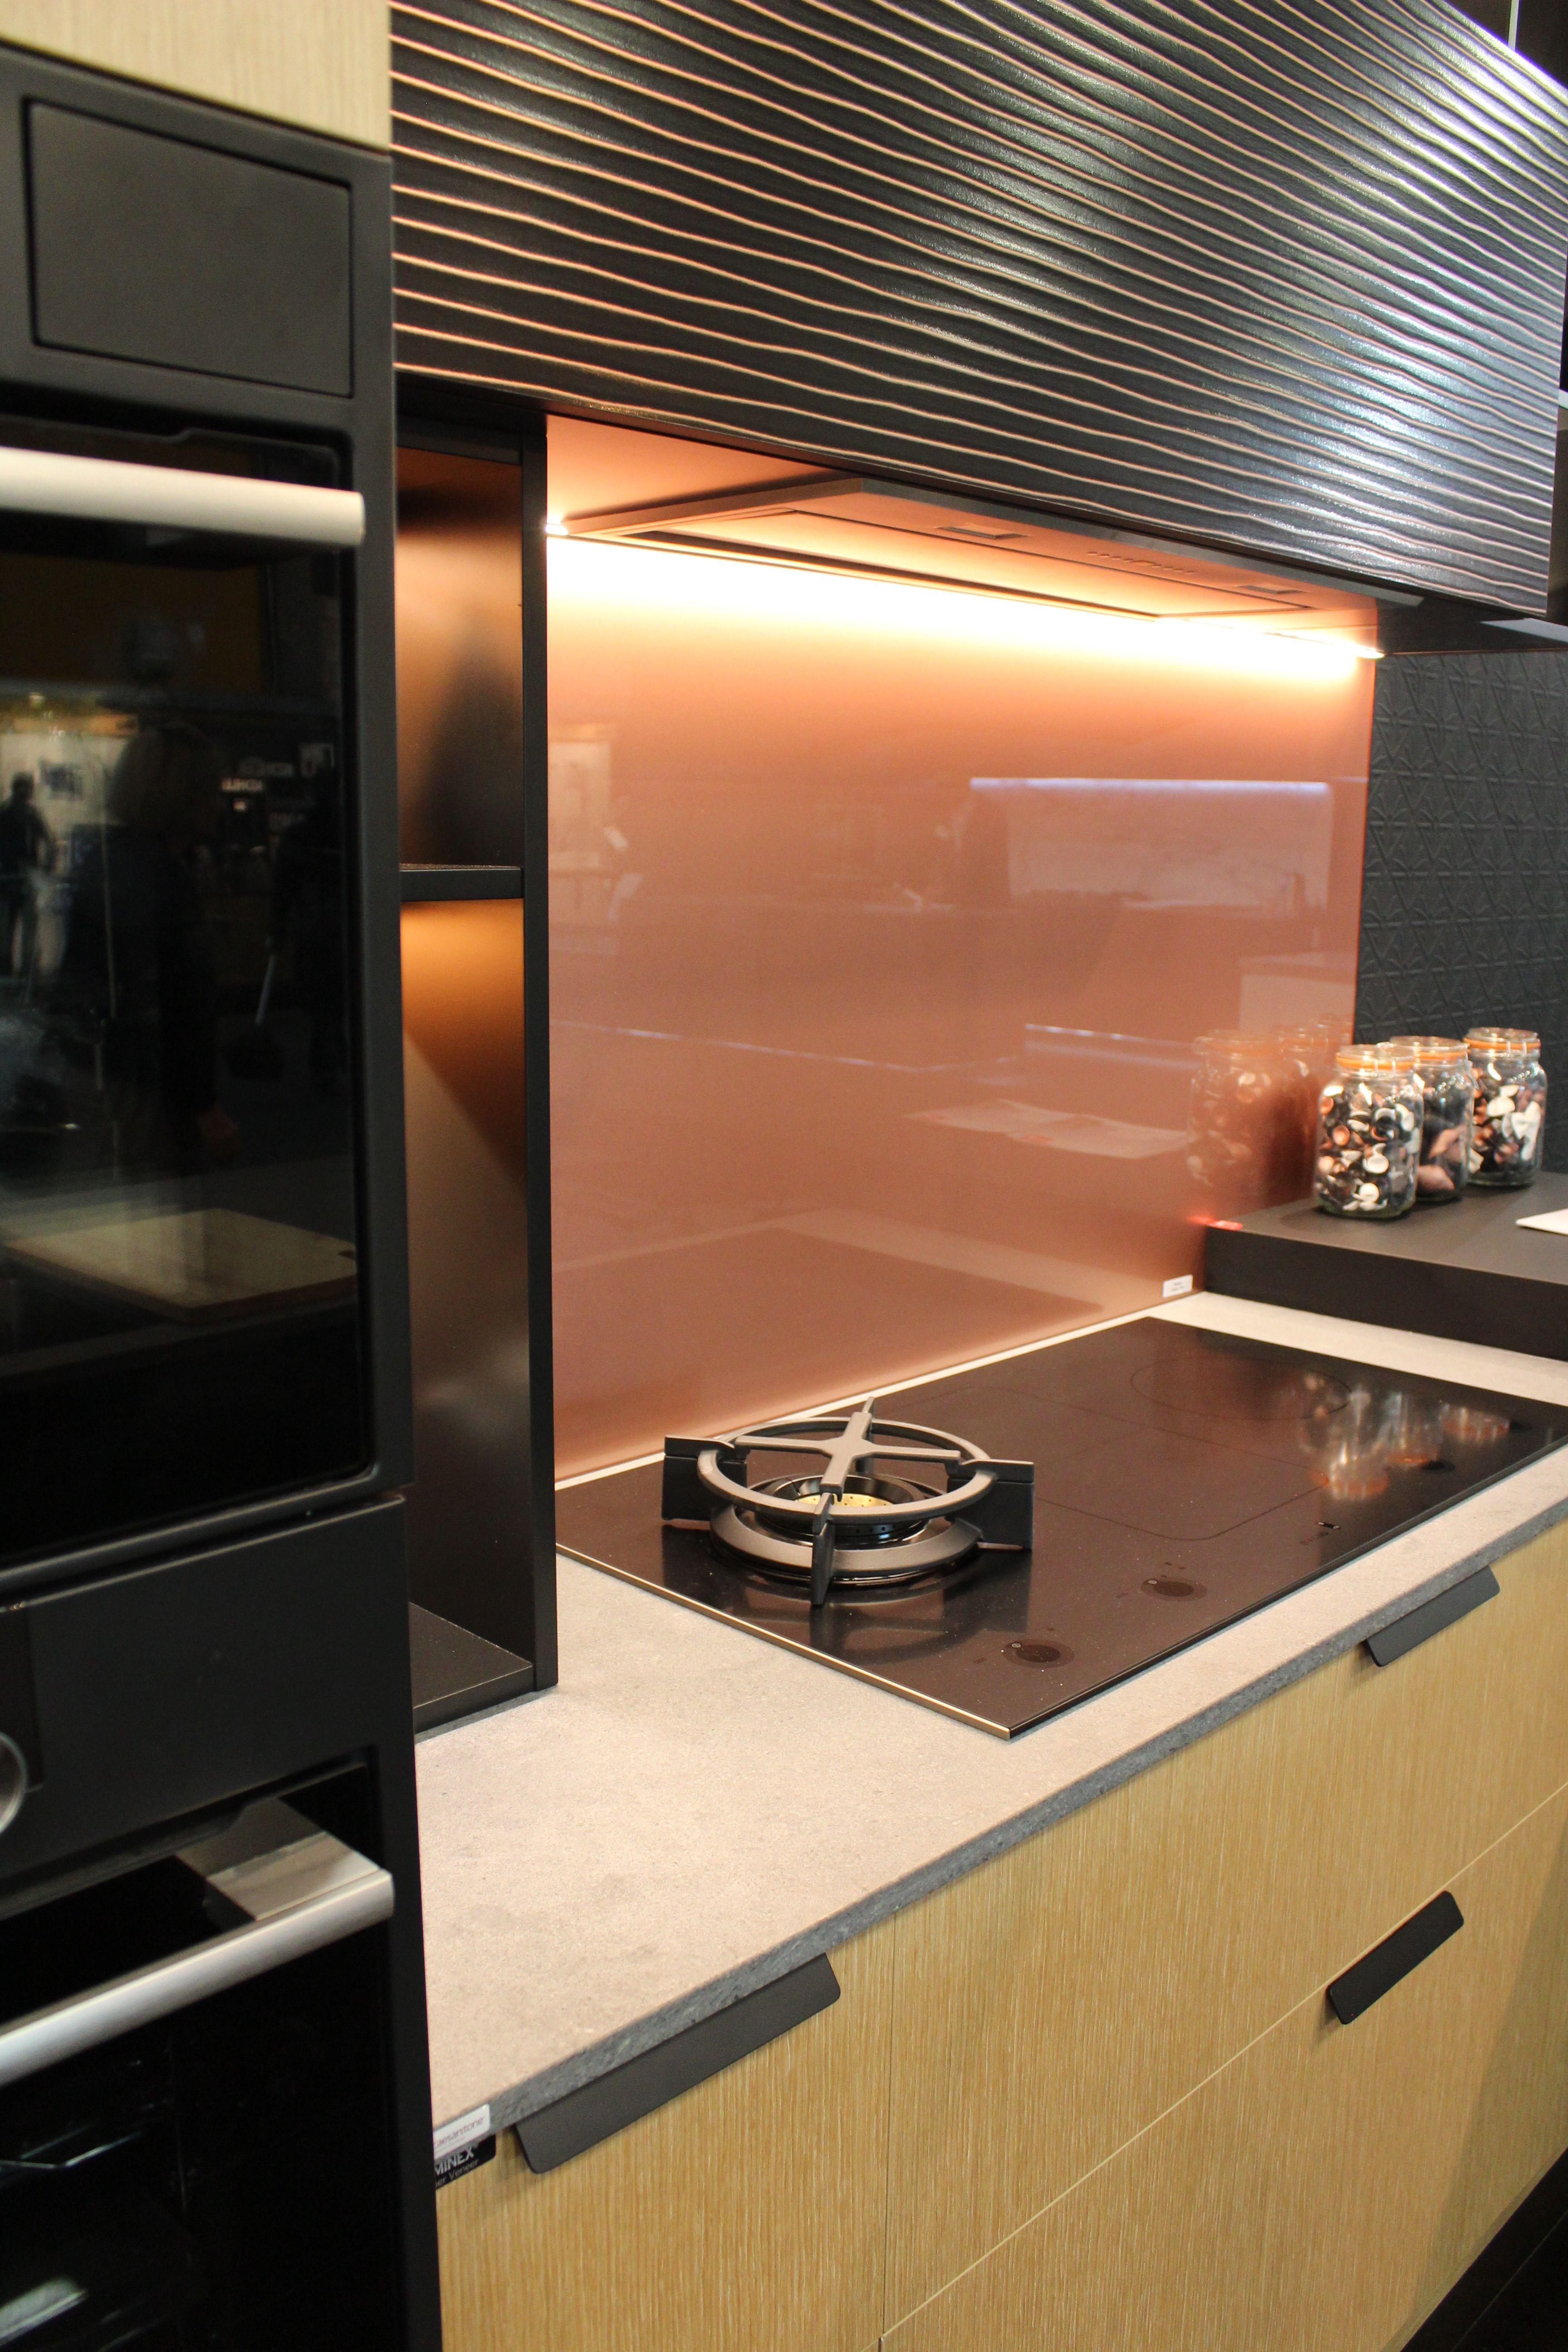 kitchen design by colleen holder fabrication by macgregor kitchens rh pinterest com